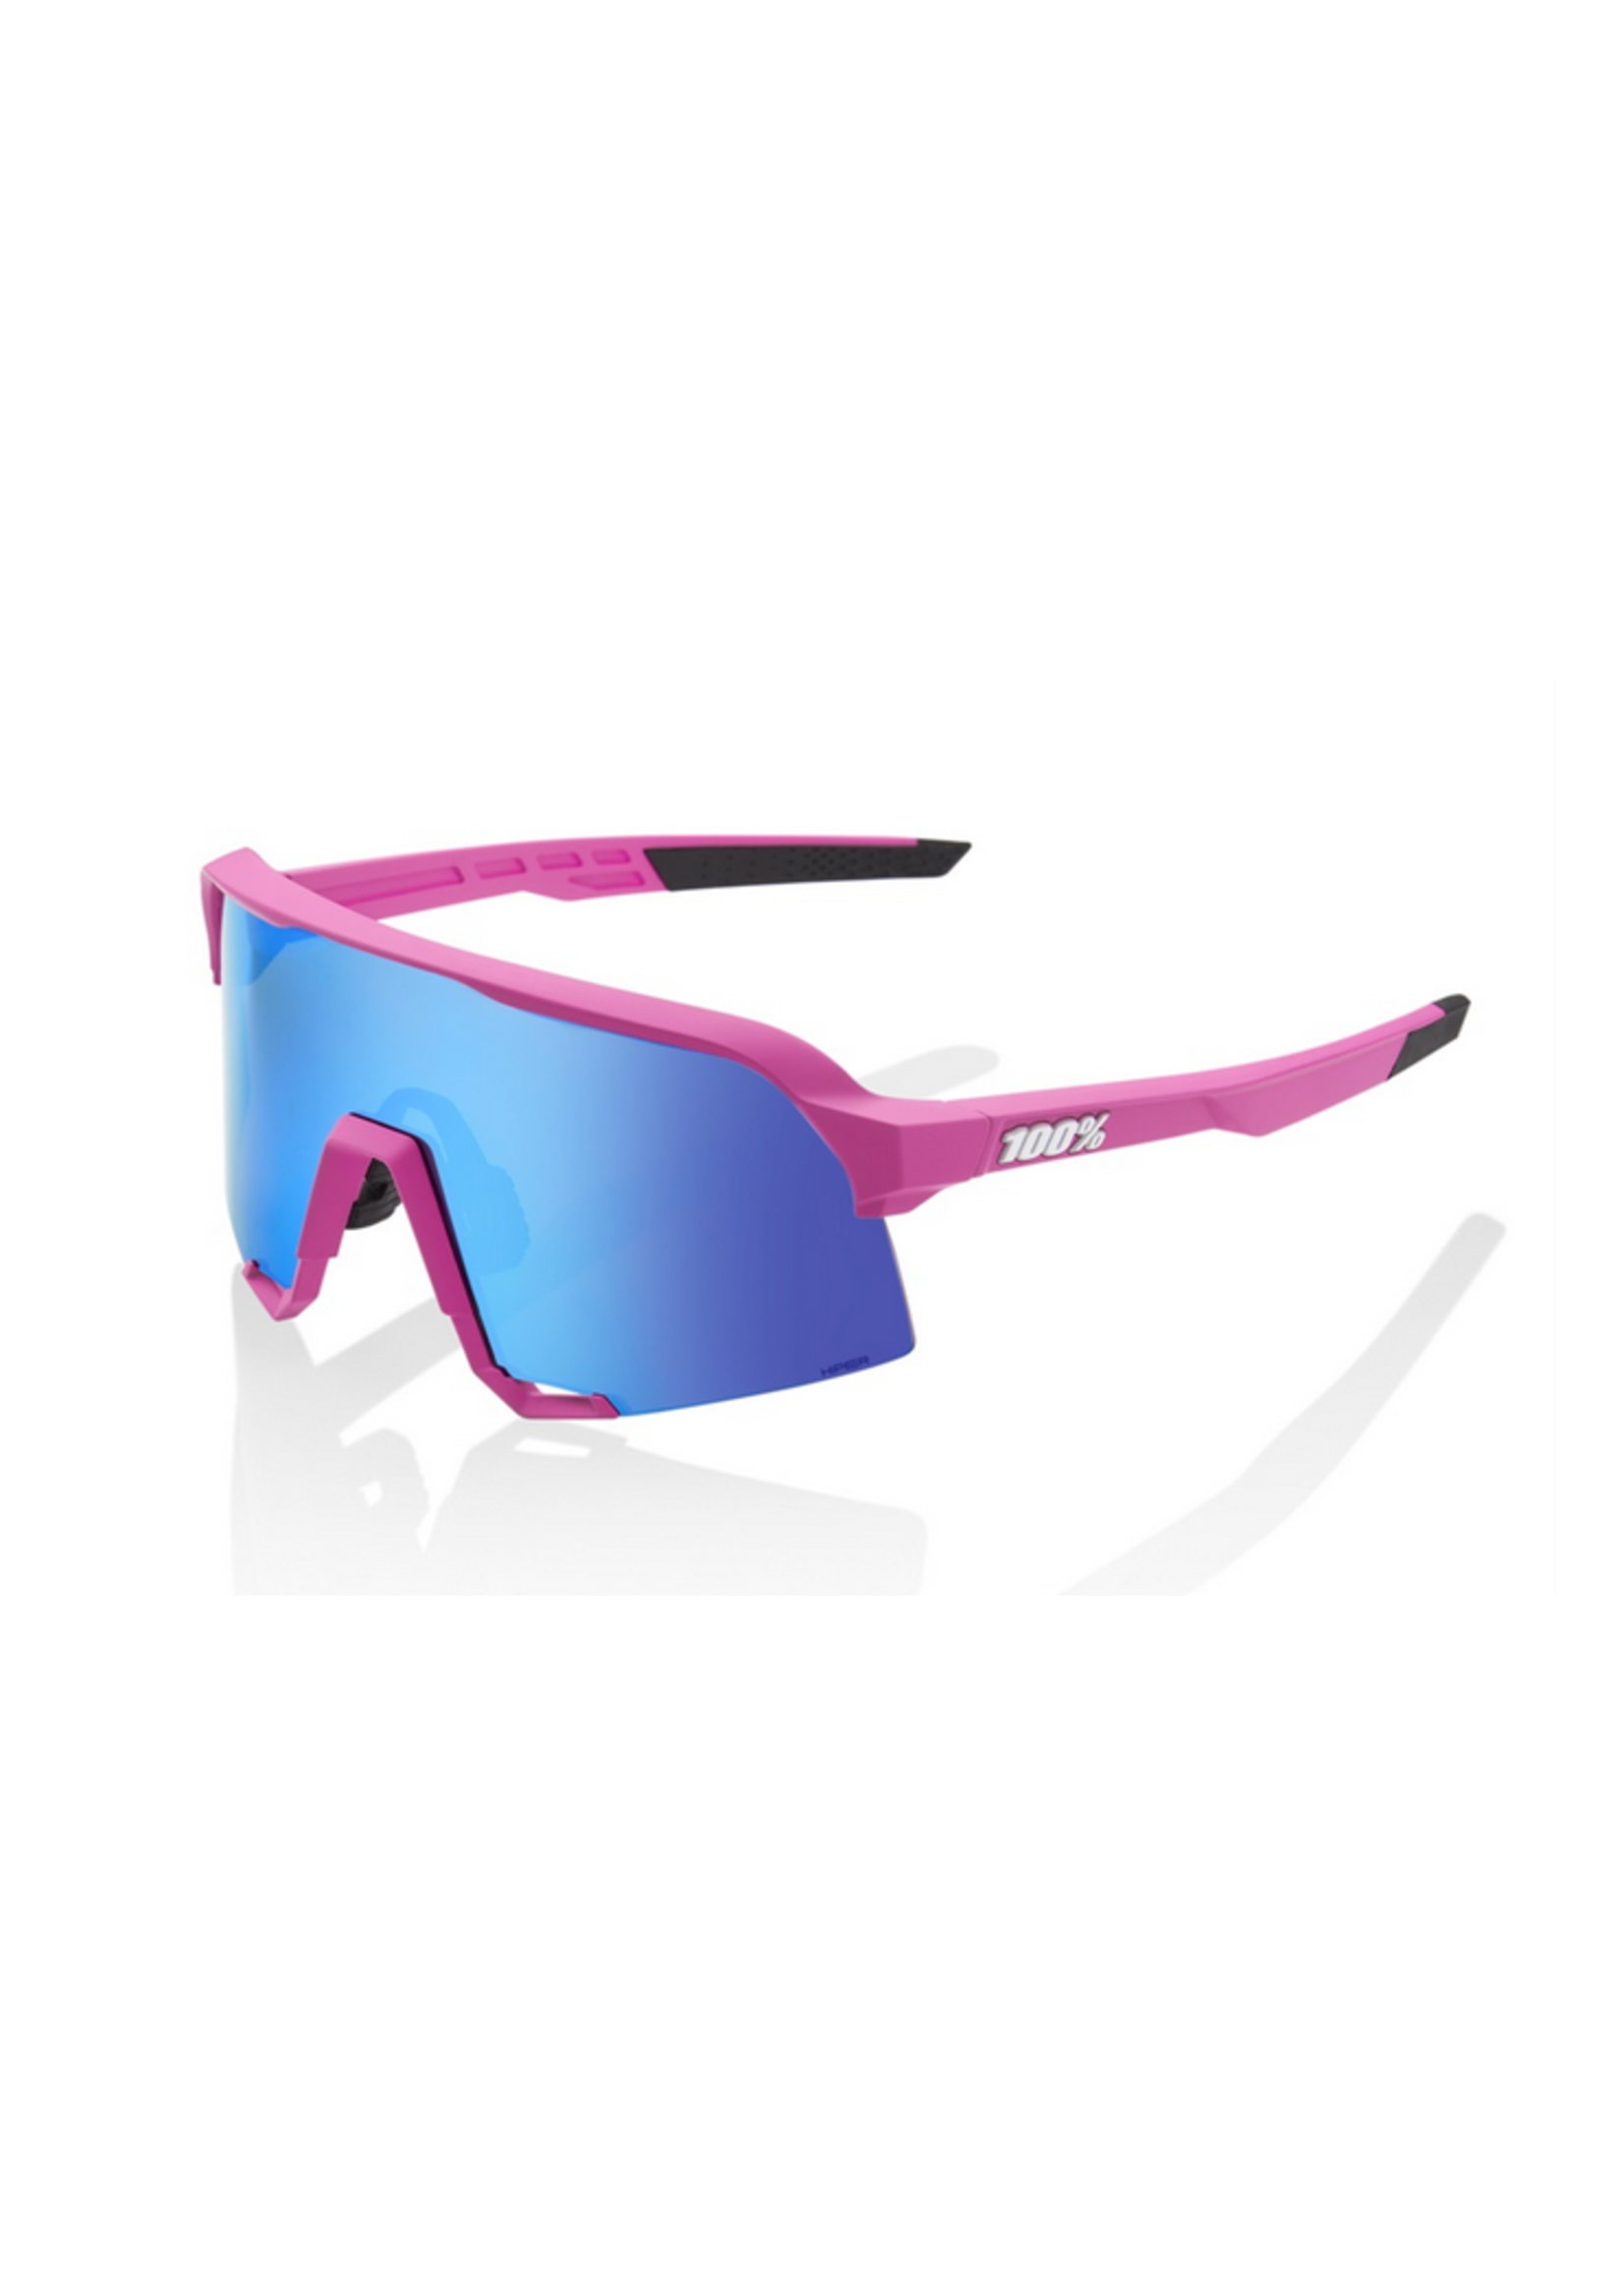 100% 100% S3 Sunglasses